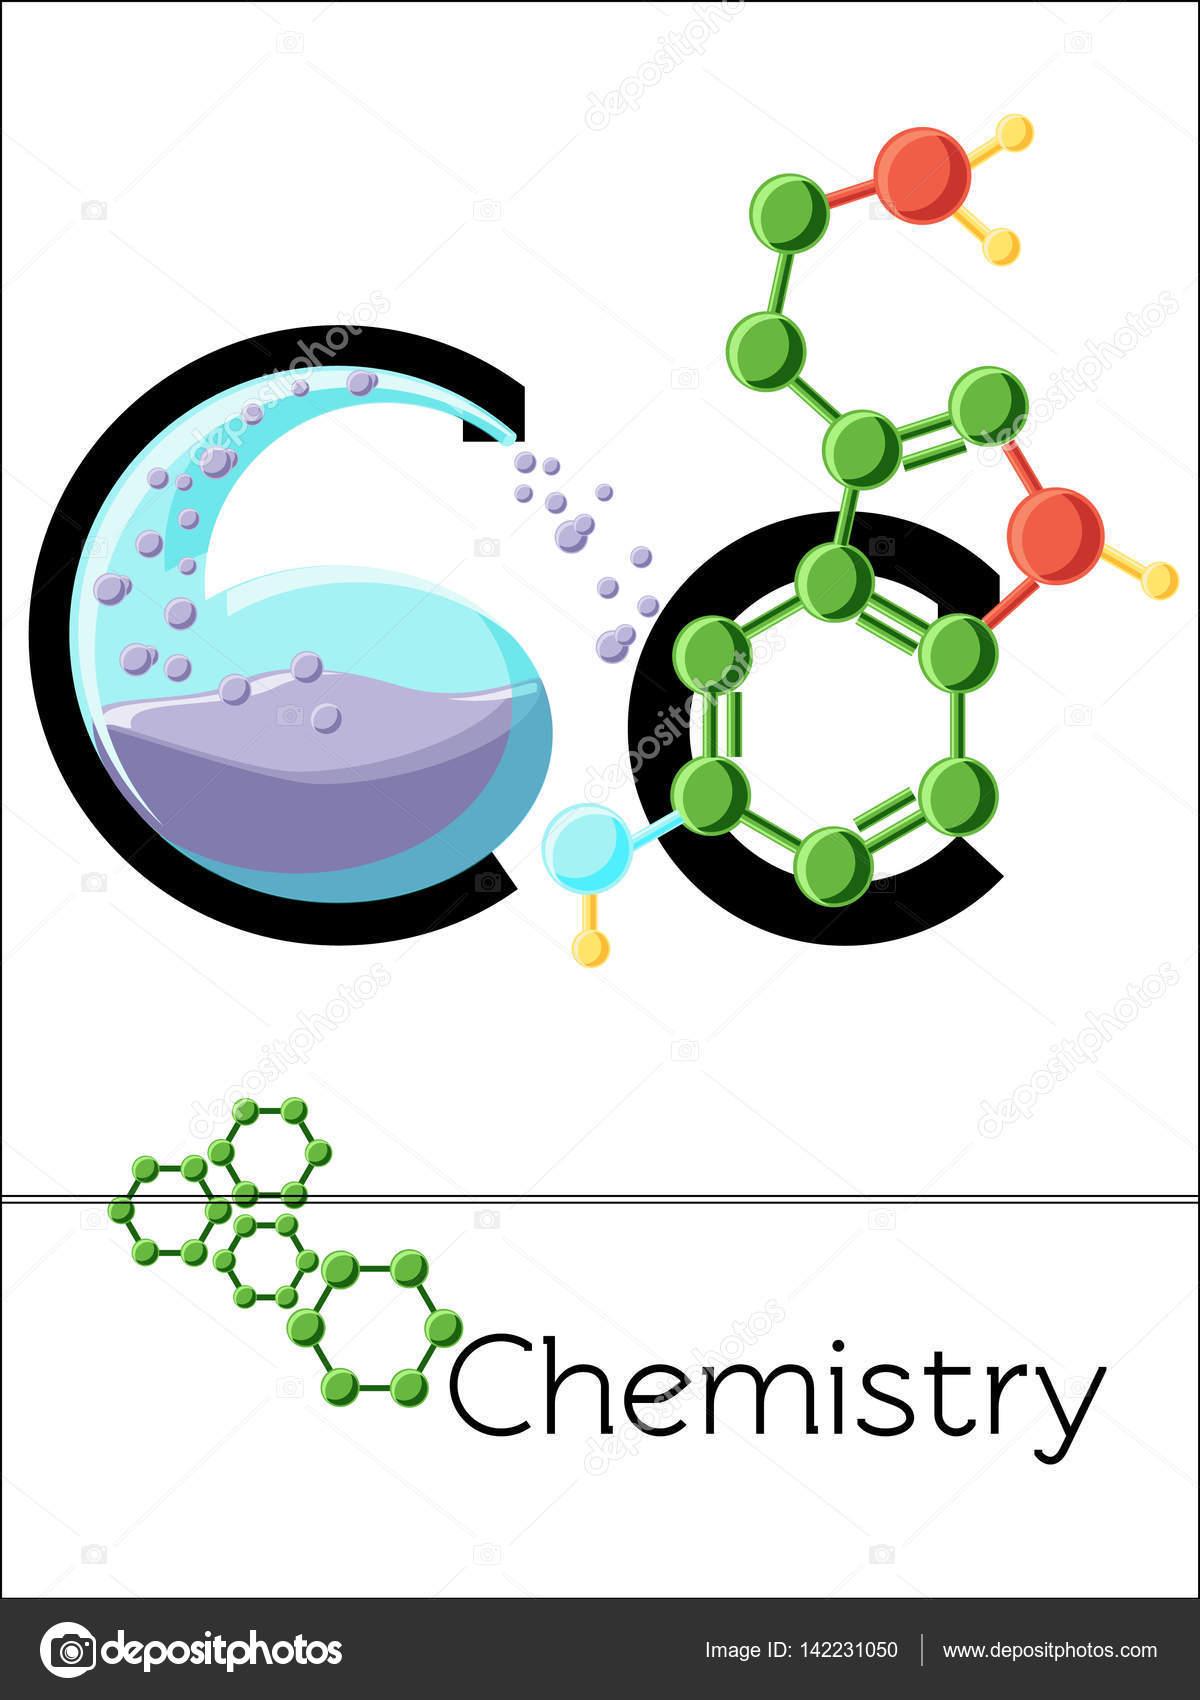 flashkarte buchstabe c ist f252r chemie � stockvektor